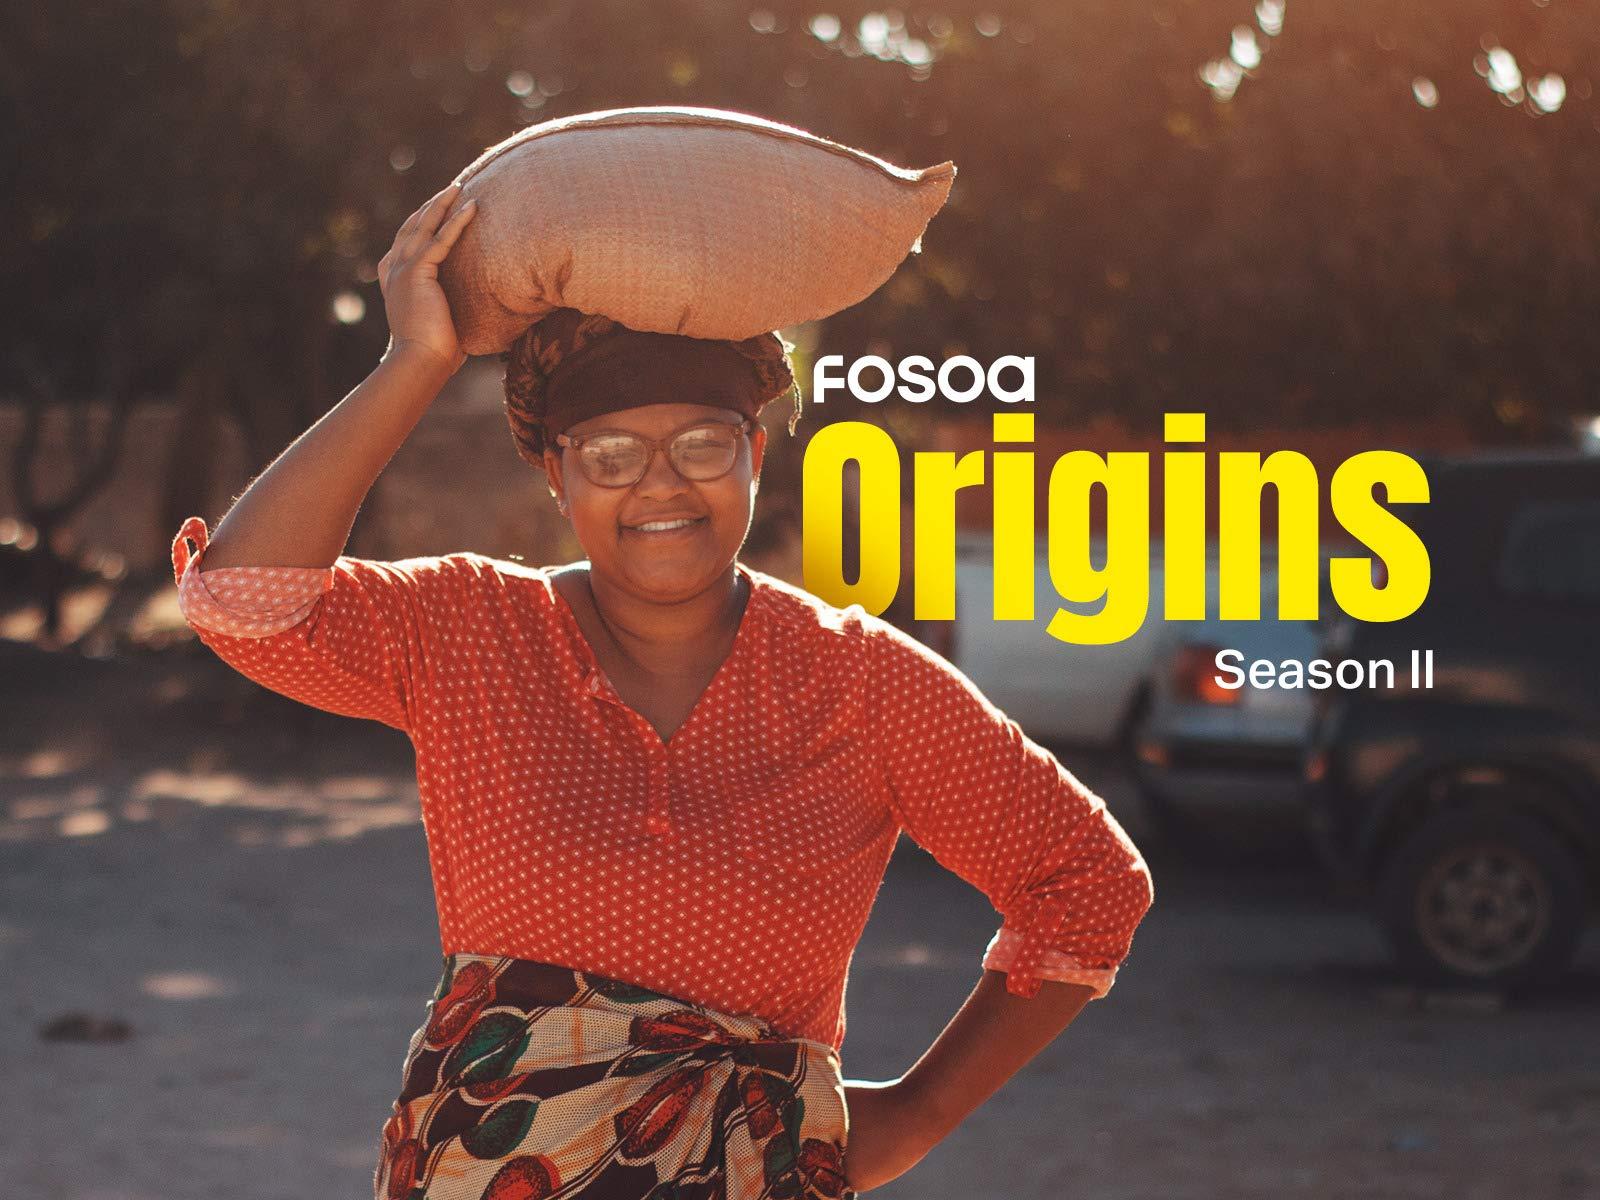 Clip: FOSOA Origins on Amazon Prime Video UK